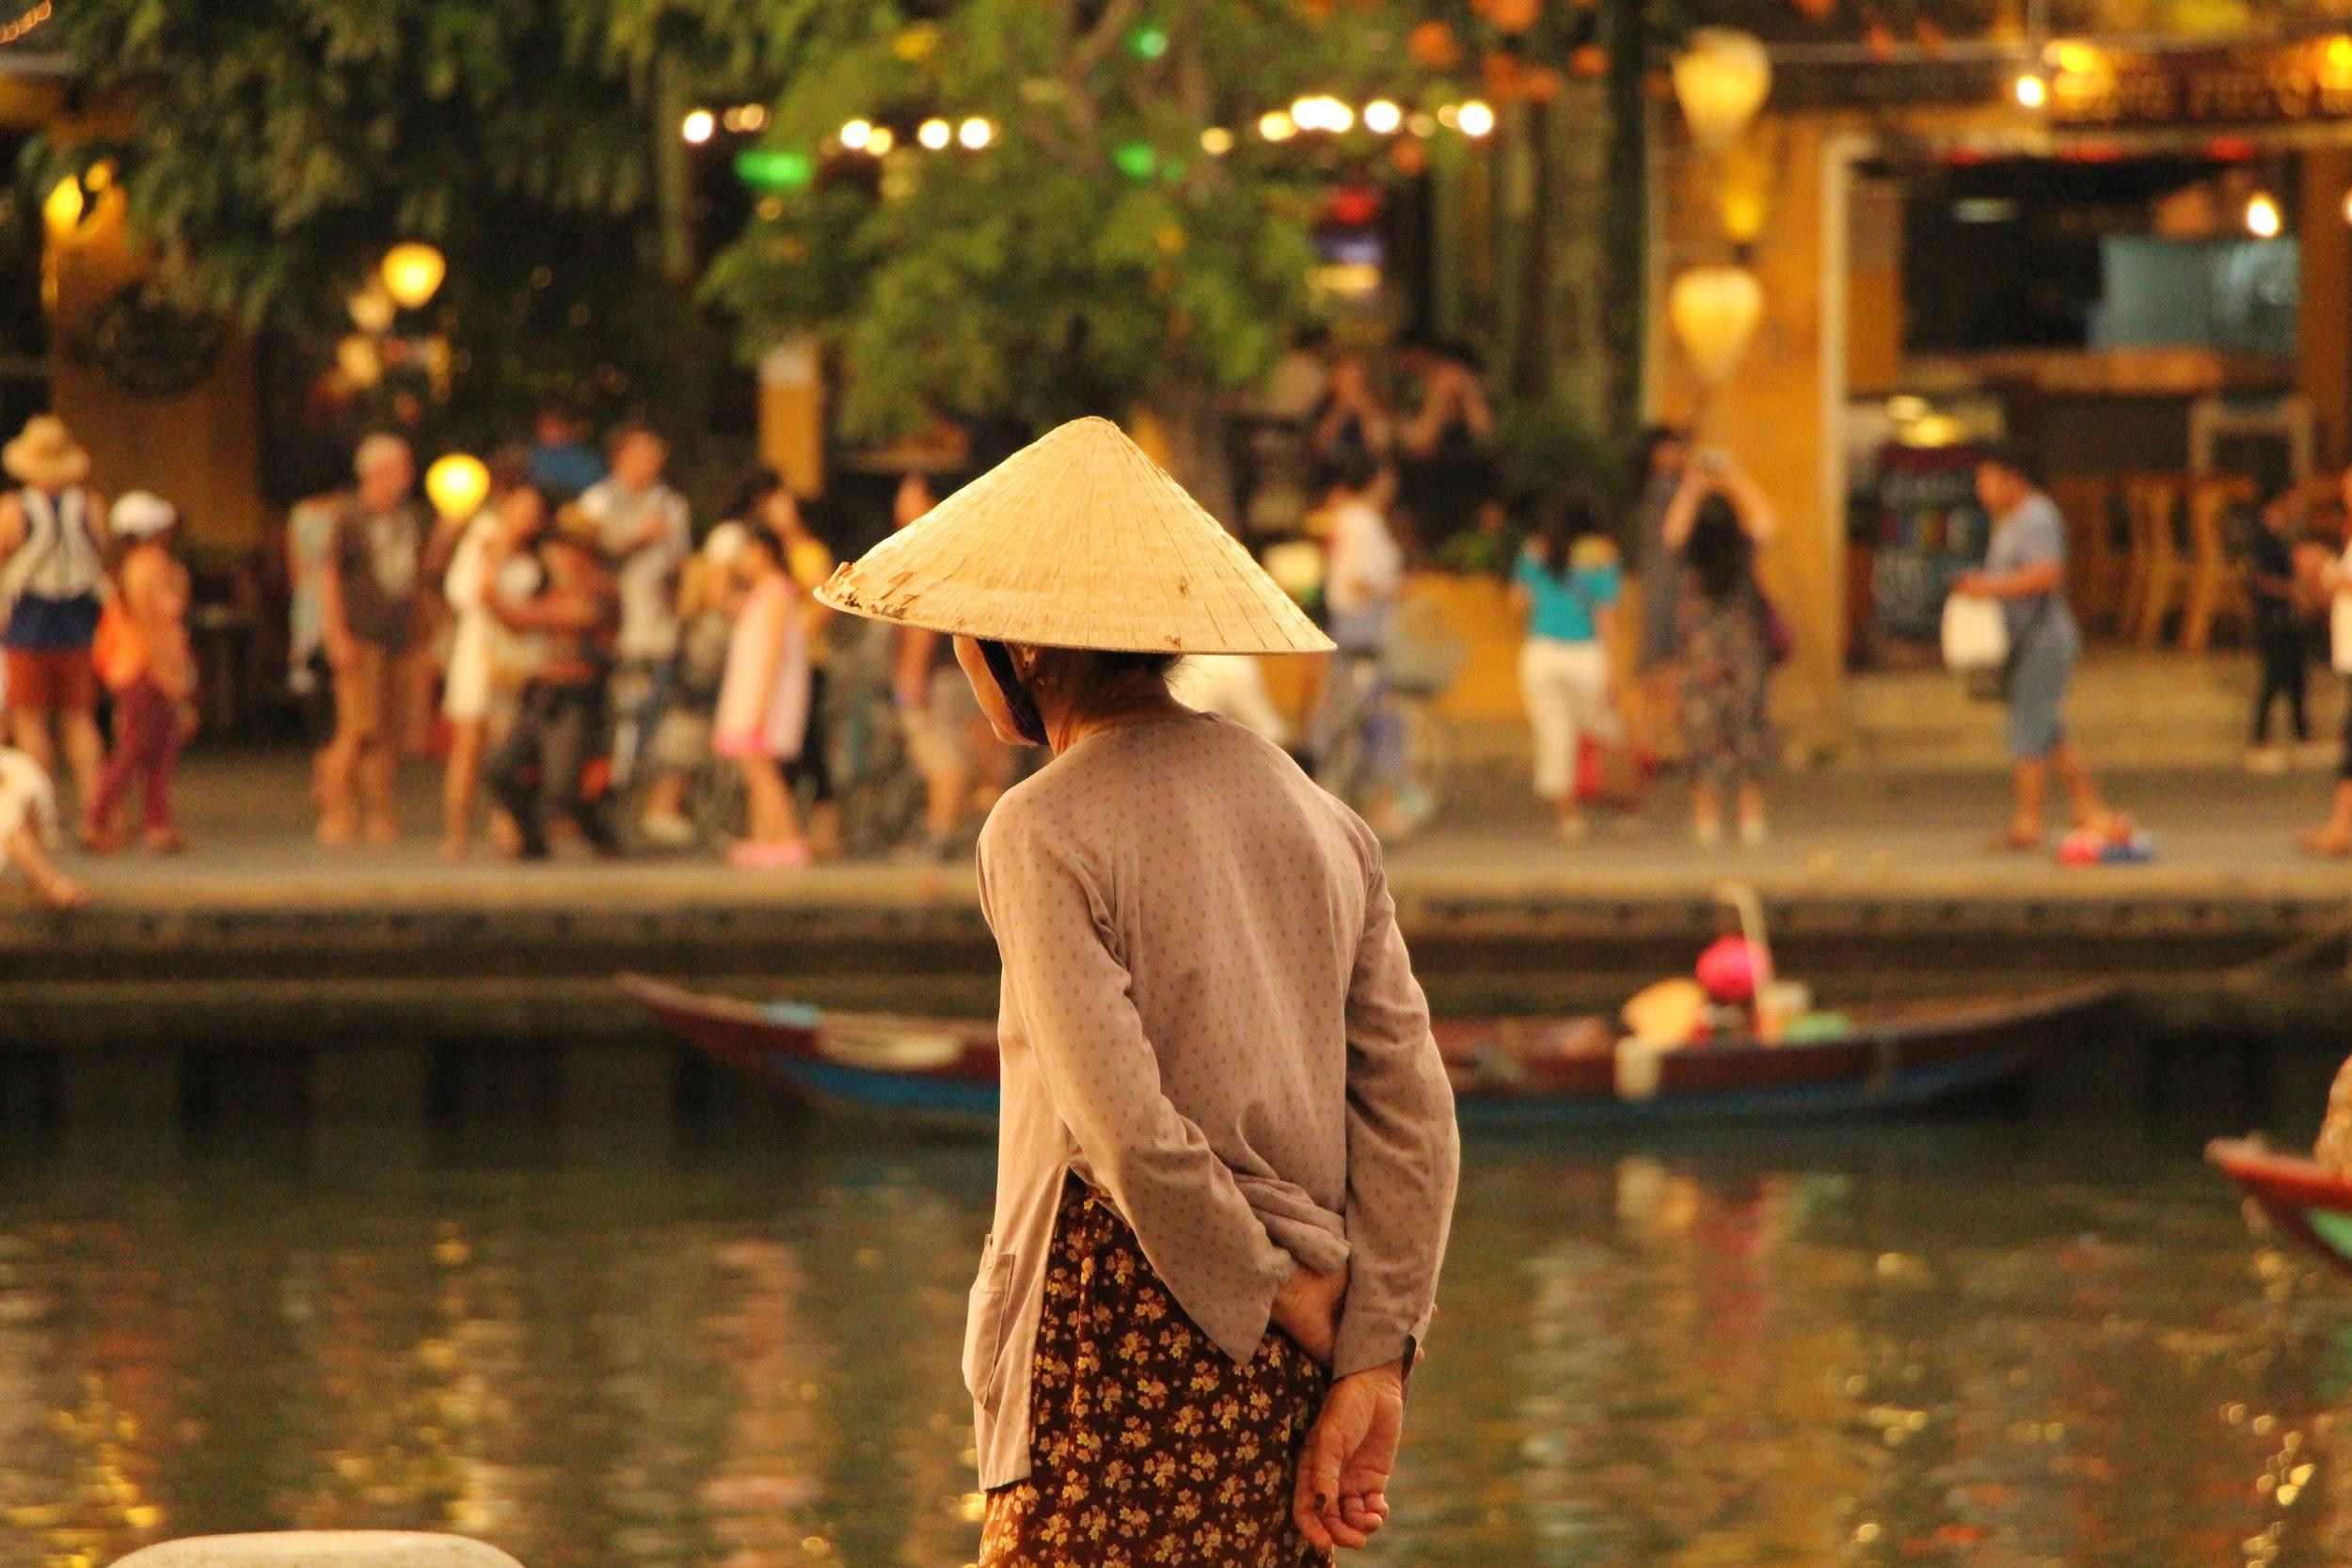 vietnam-hoi-an-katherine-mccormack-758035-unsplash.jpg